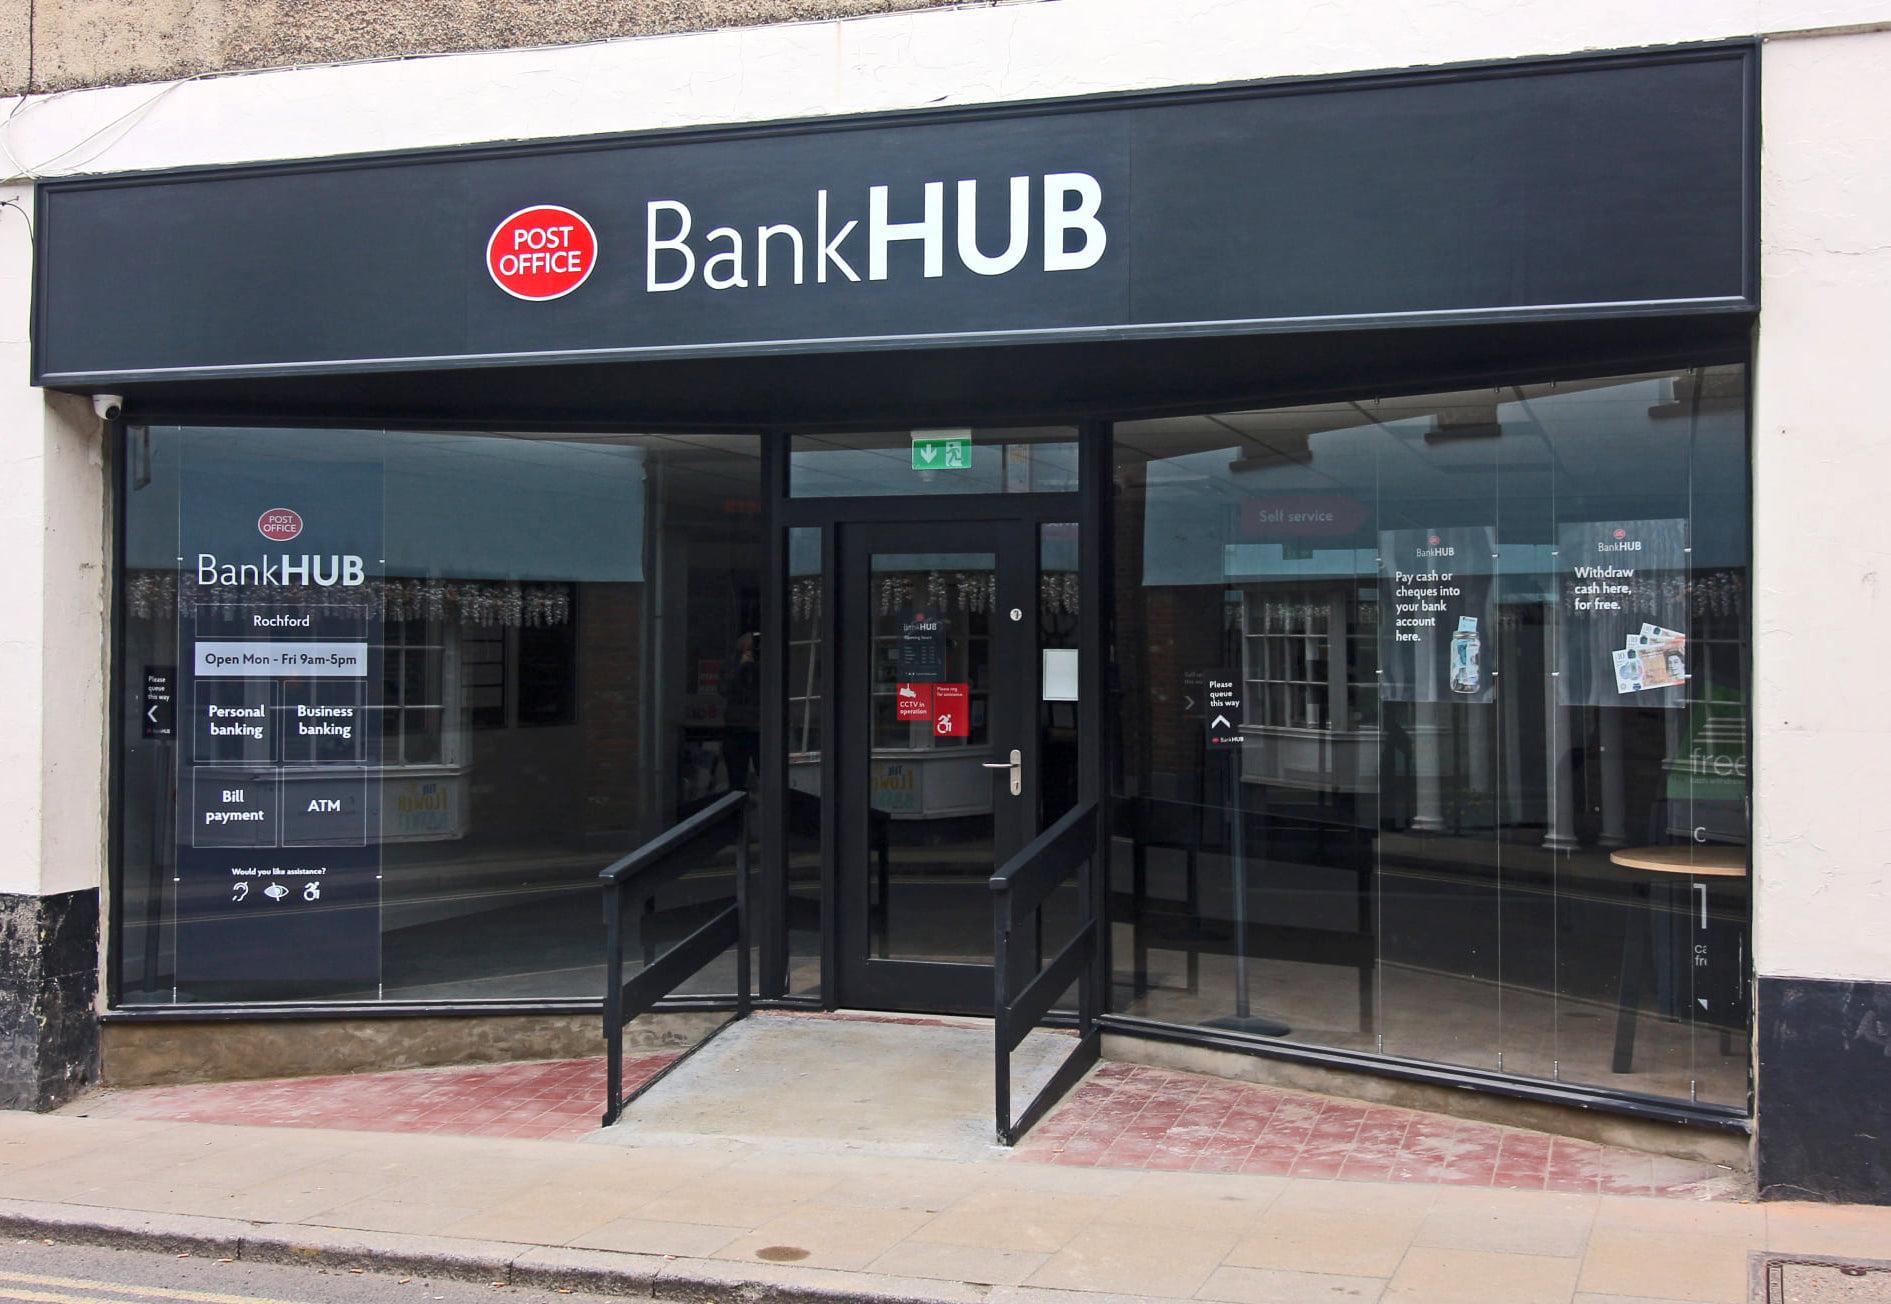 BankHub sop front